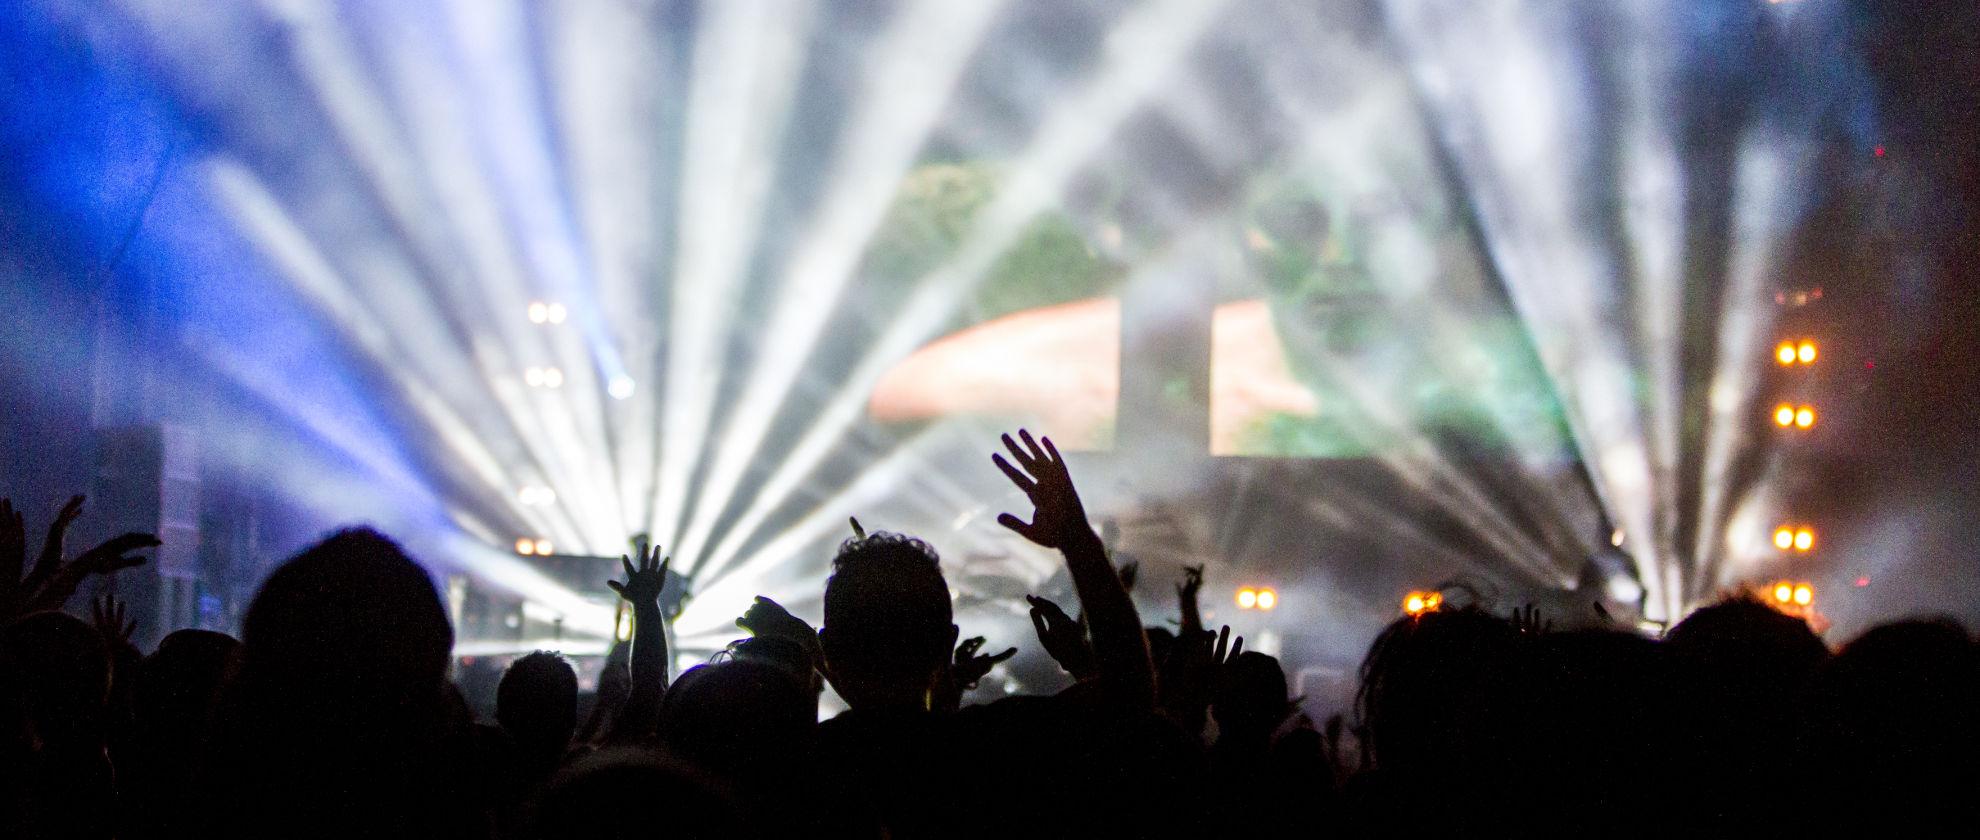 6 of the Best Overseas Festivals